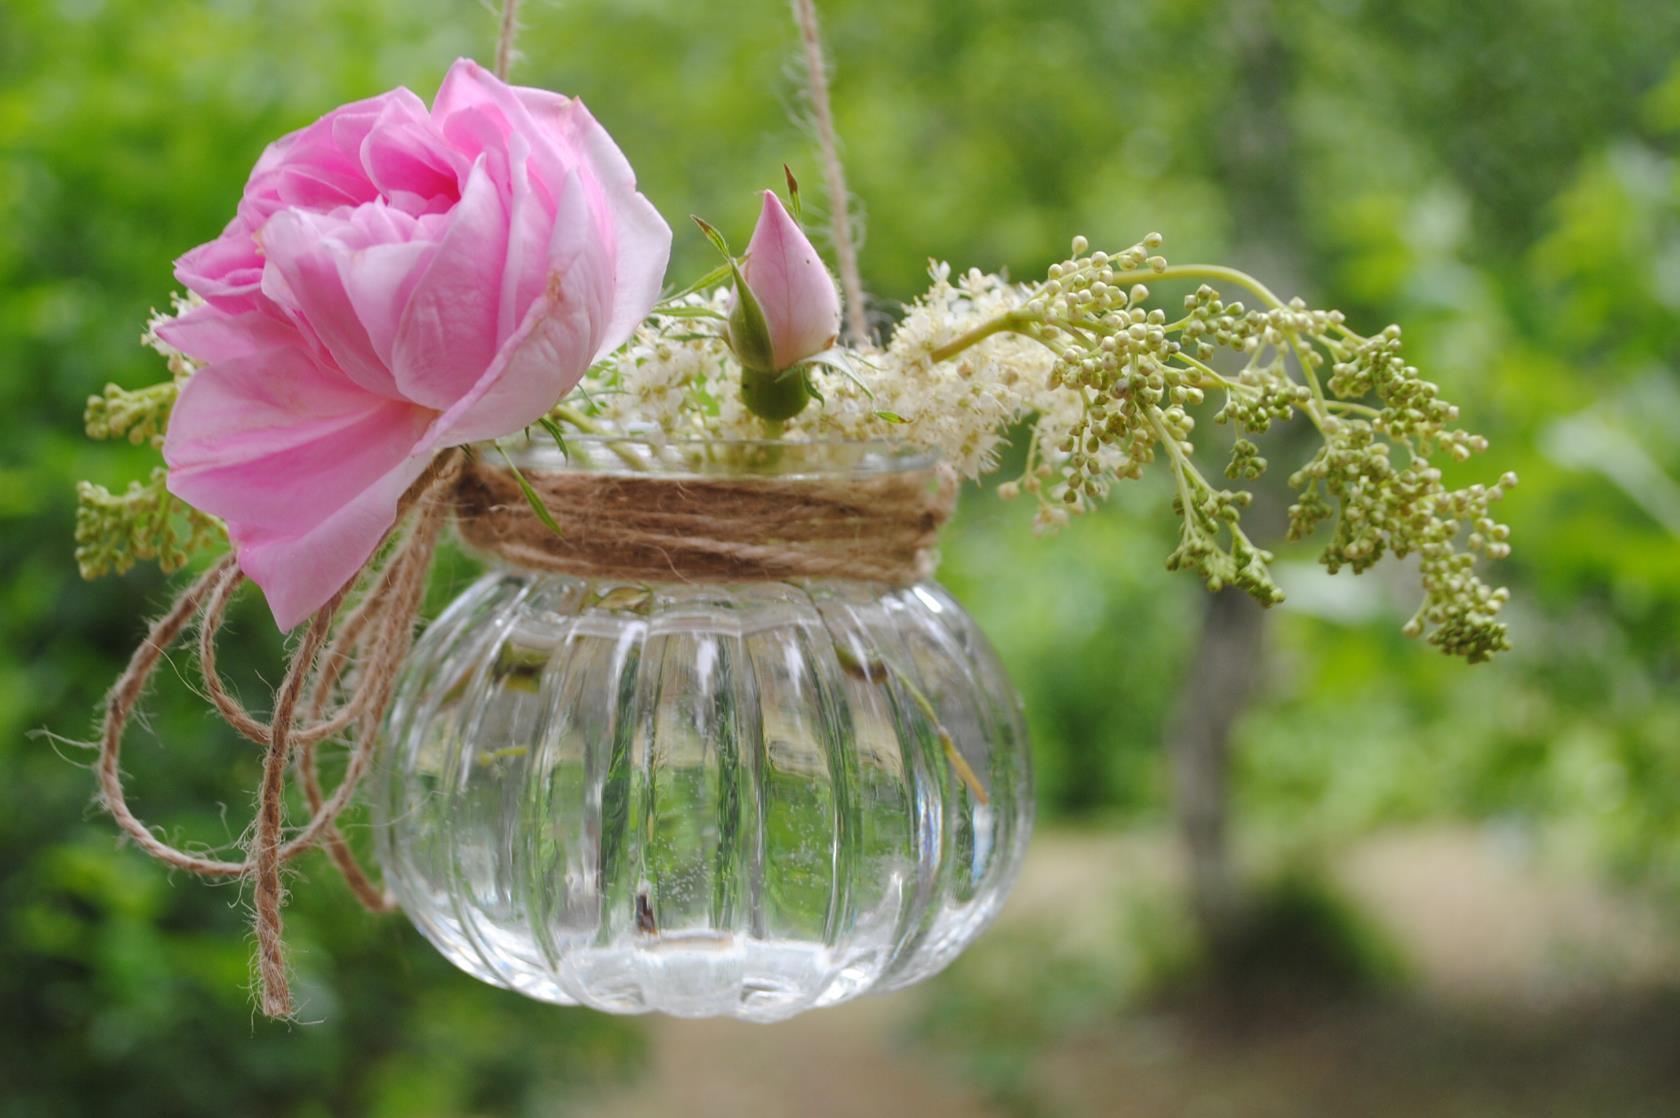 мини-букет с розой